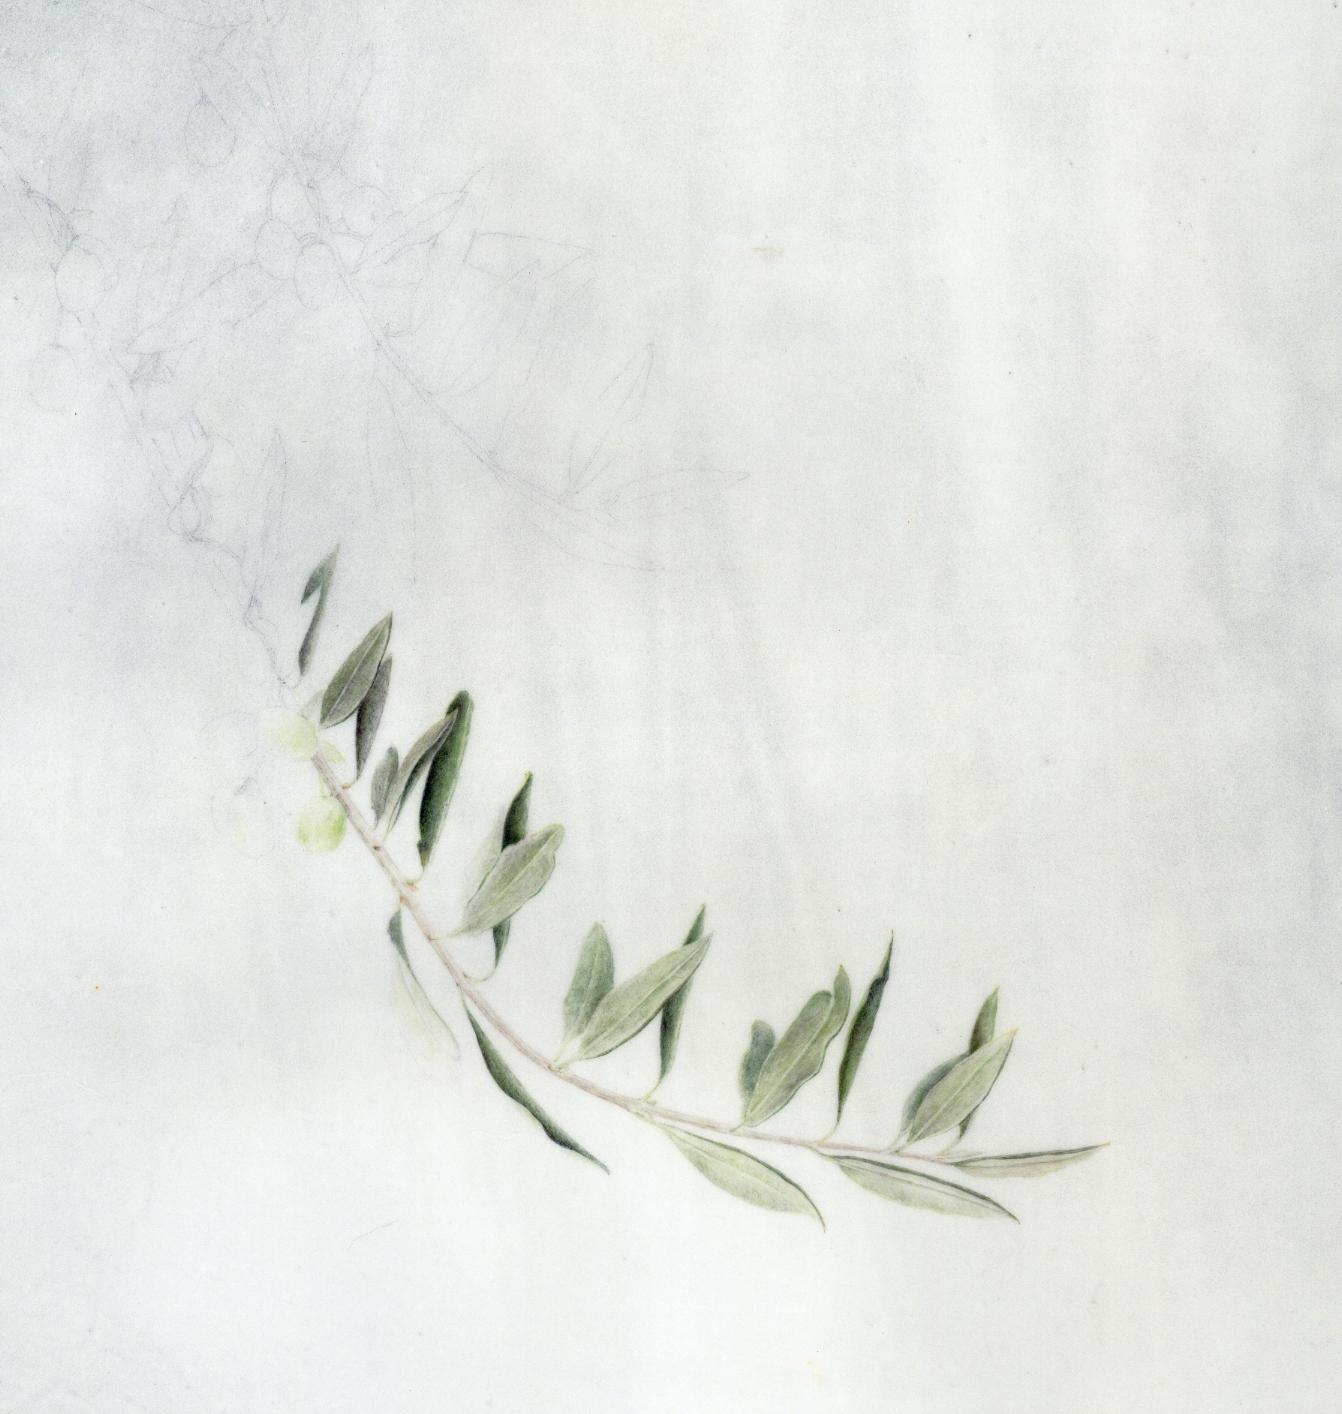 olive branch  olive branch  olive branch   work